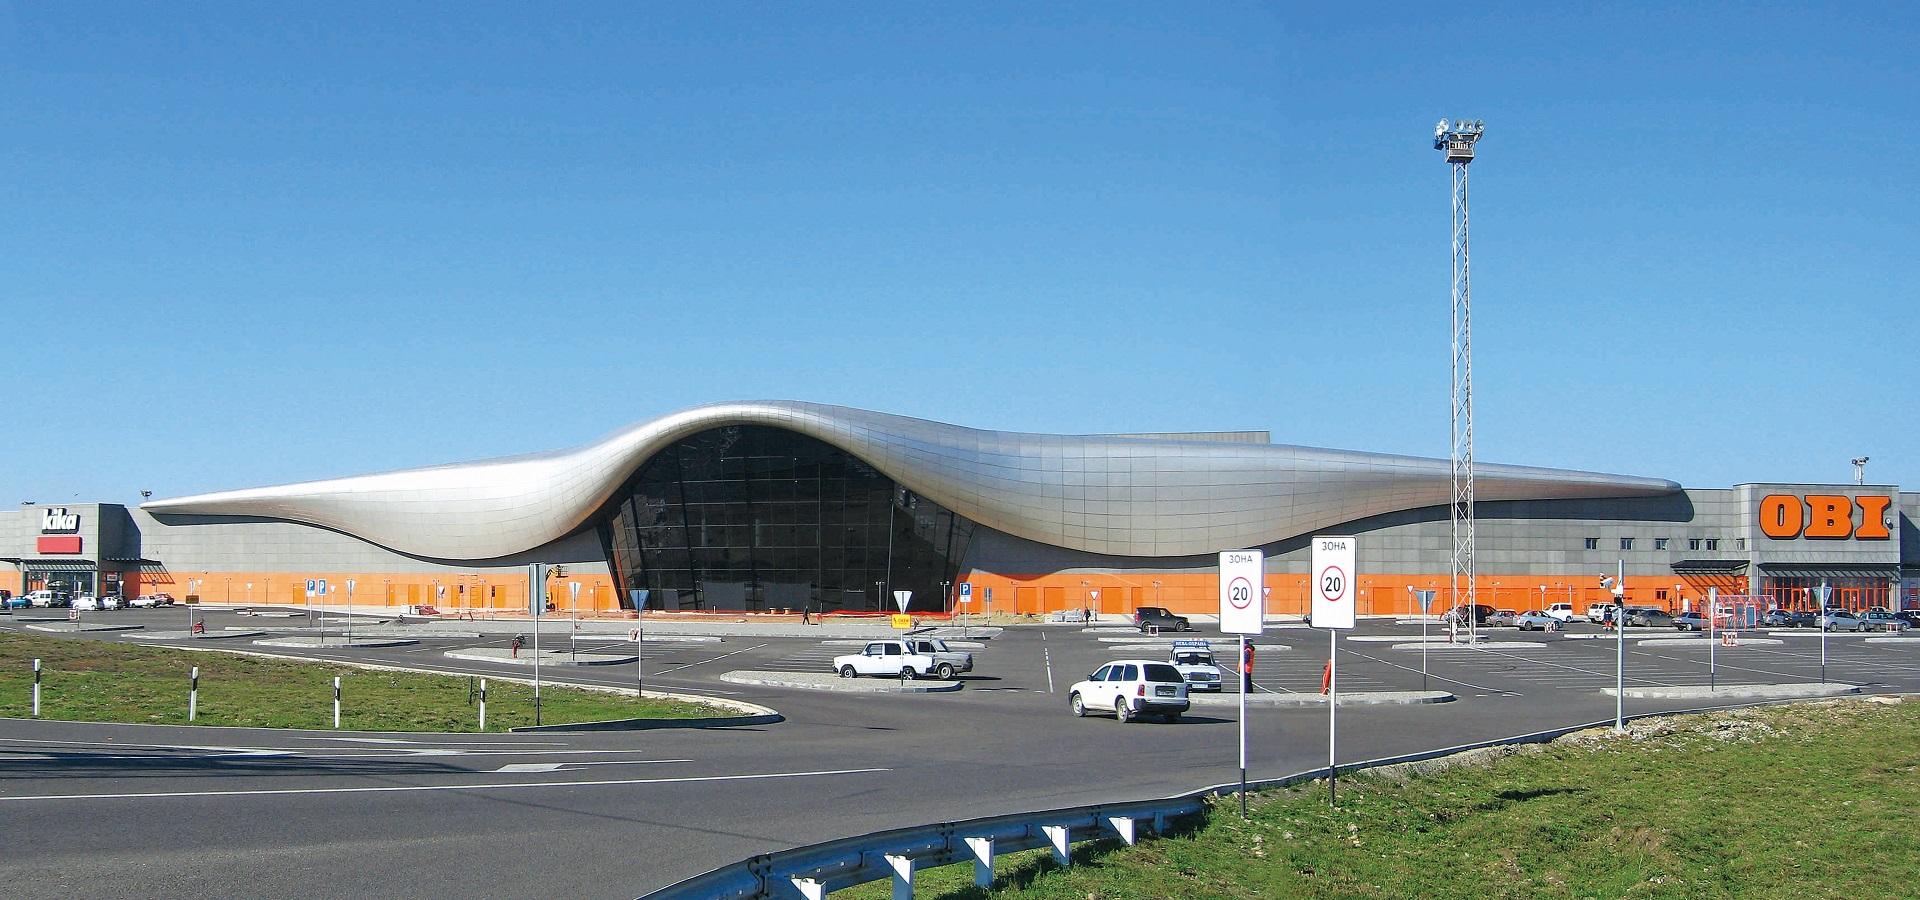 Landscape view of Oz Mall across the main car park